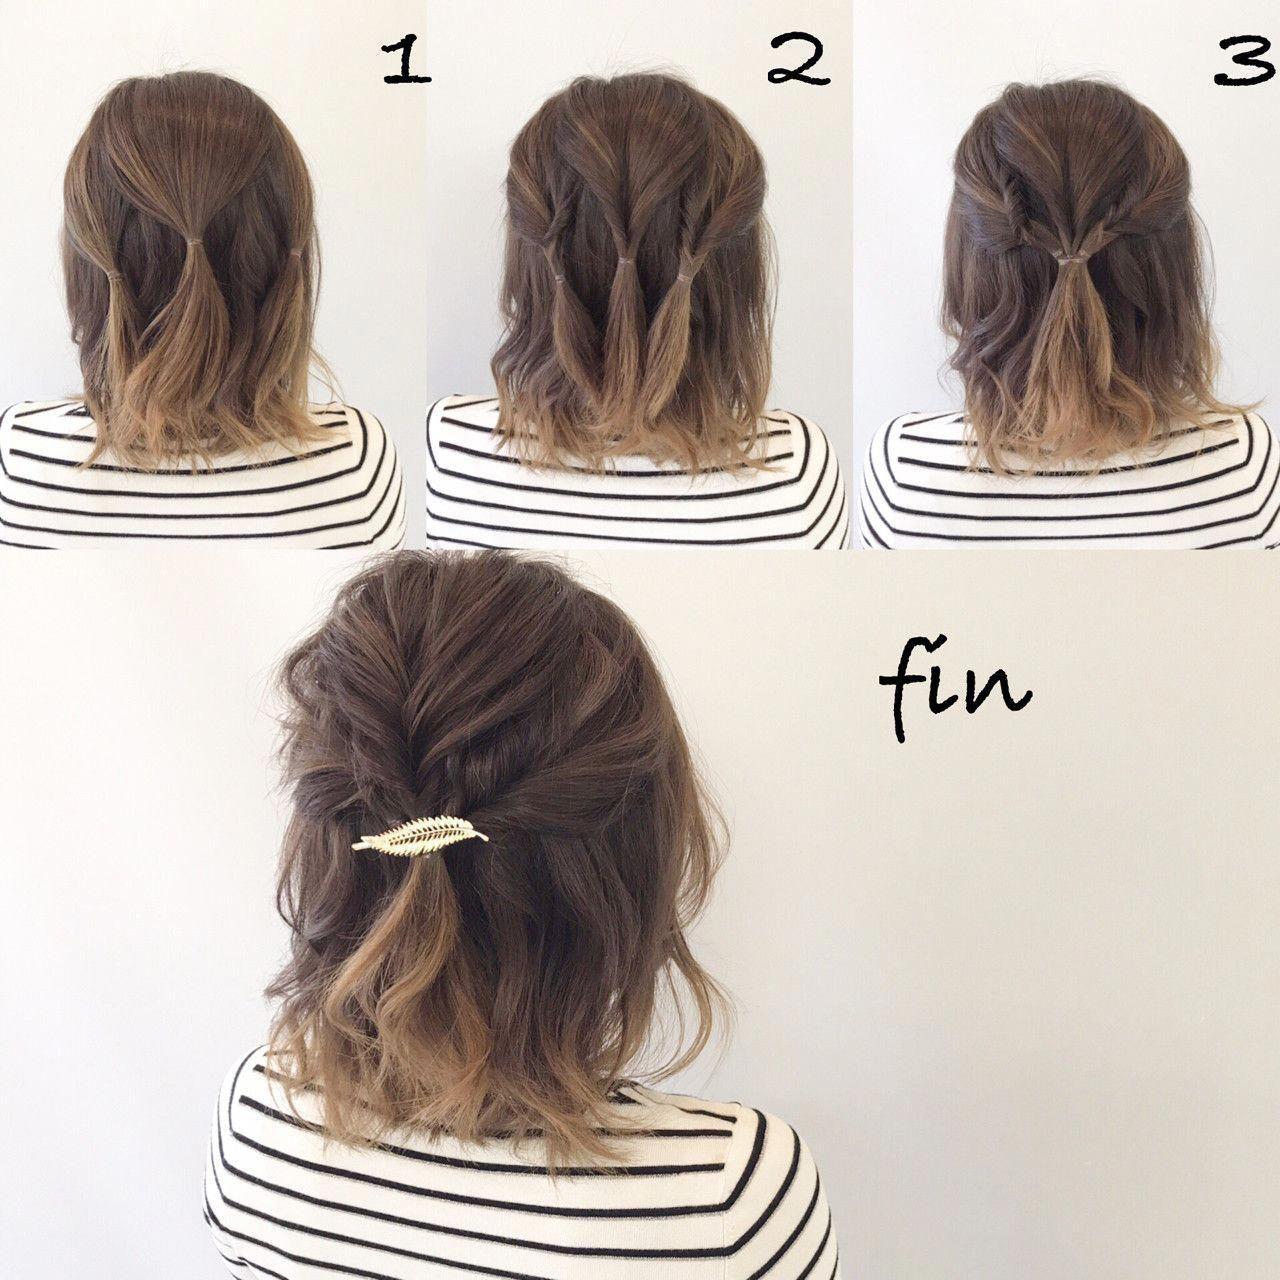 Peinados Despeinados Para Tu Graduacion Easyhairstylesquick Hair Styles Short Hair Updo Short Hair Styles